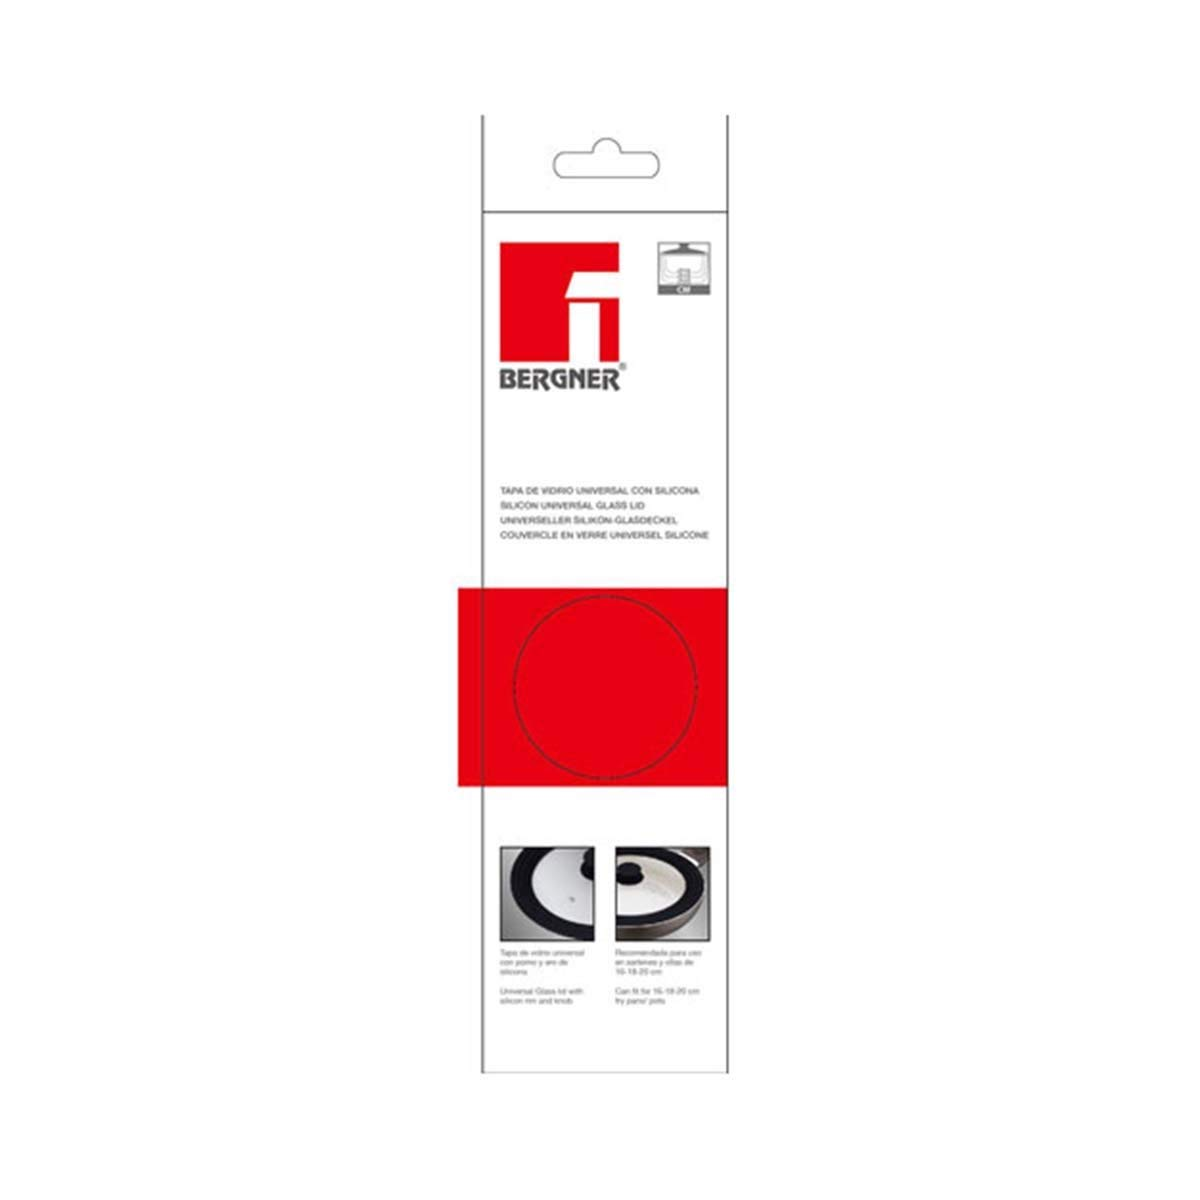 KAISERHOFF Tapa Universal de Vidrio, 16, 1 y 20 cm